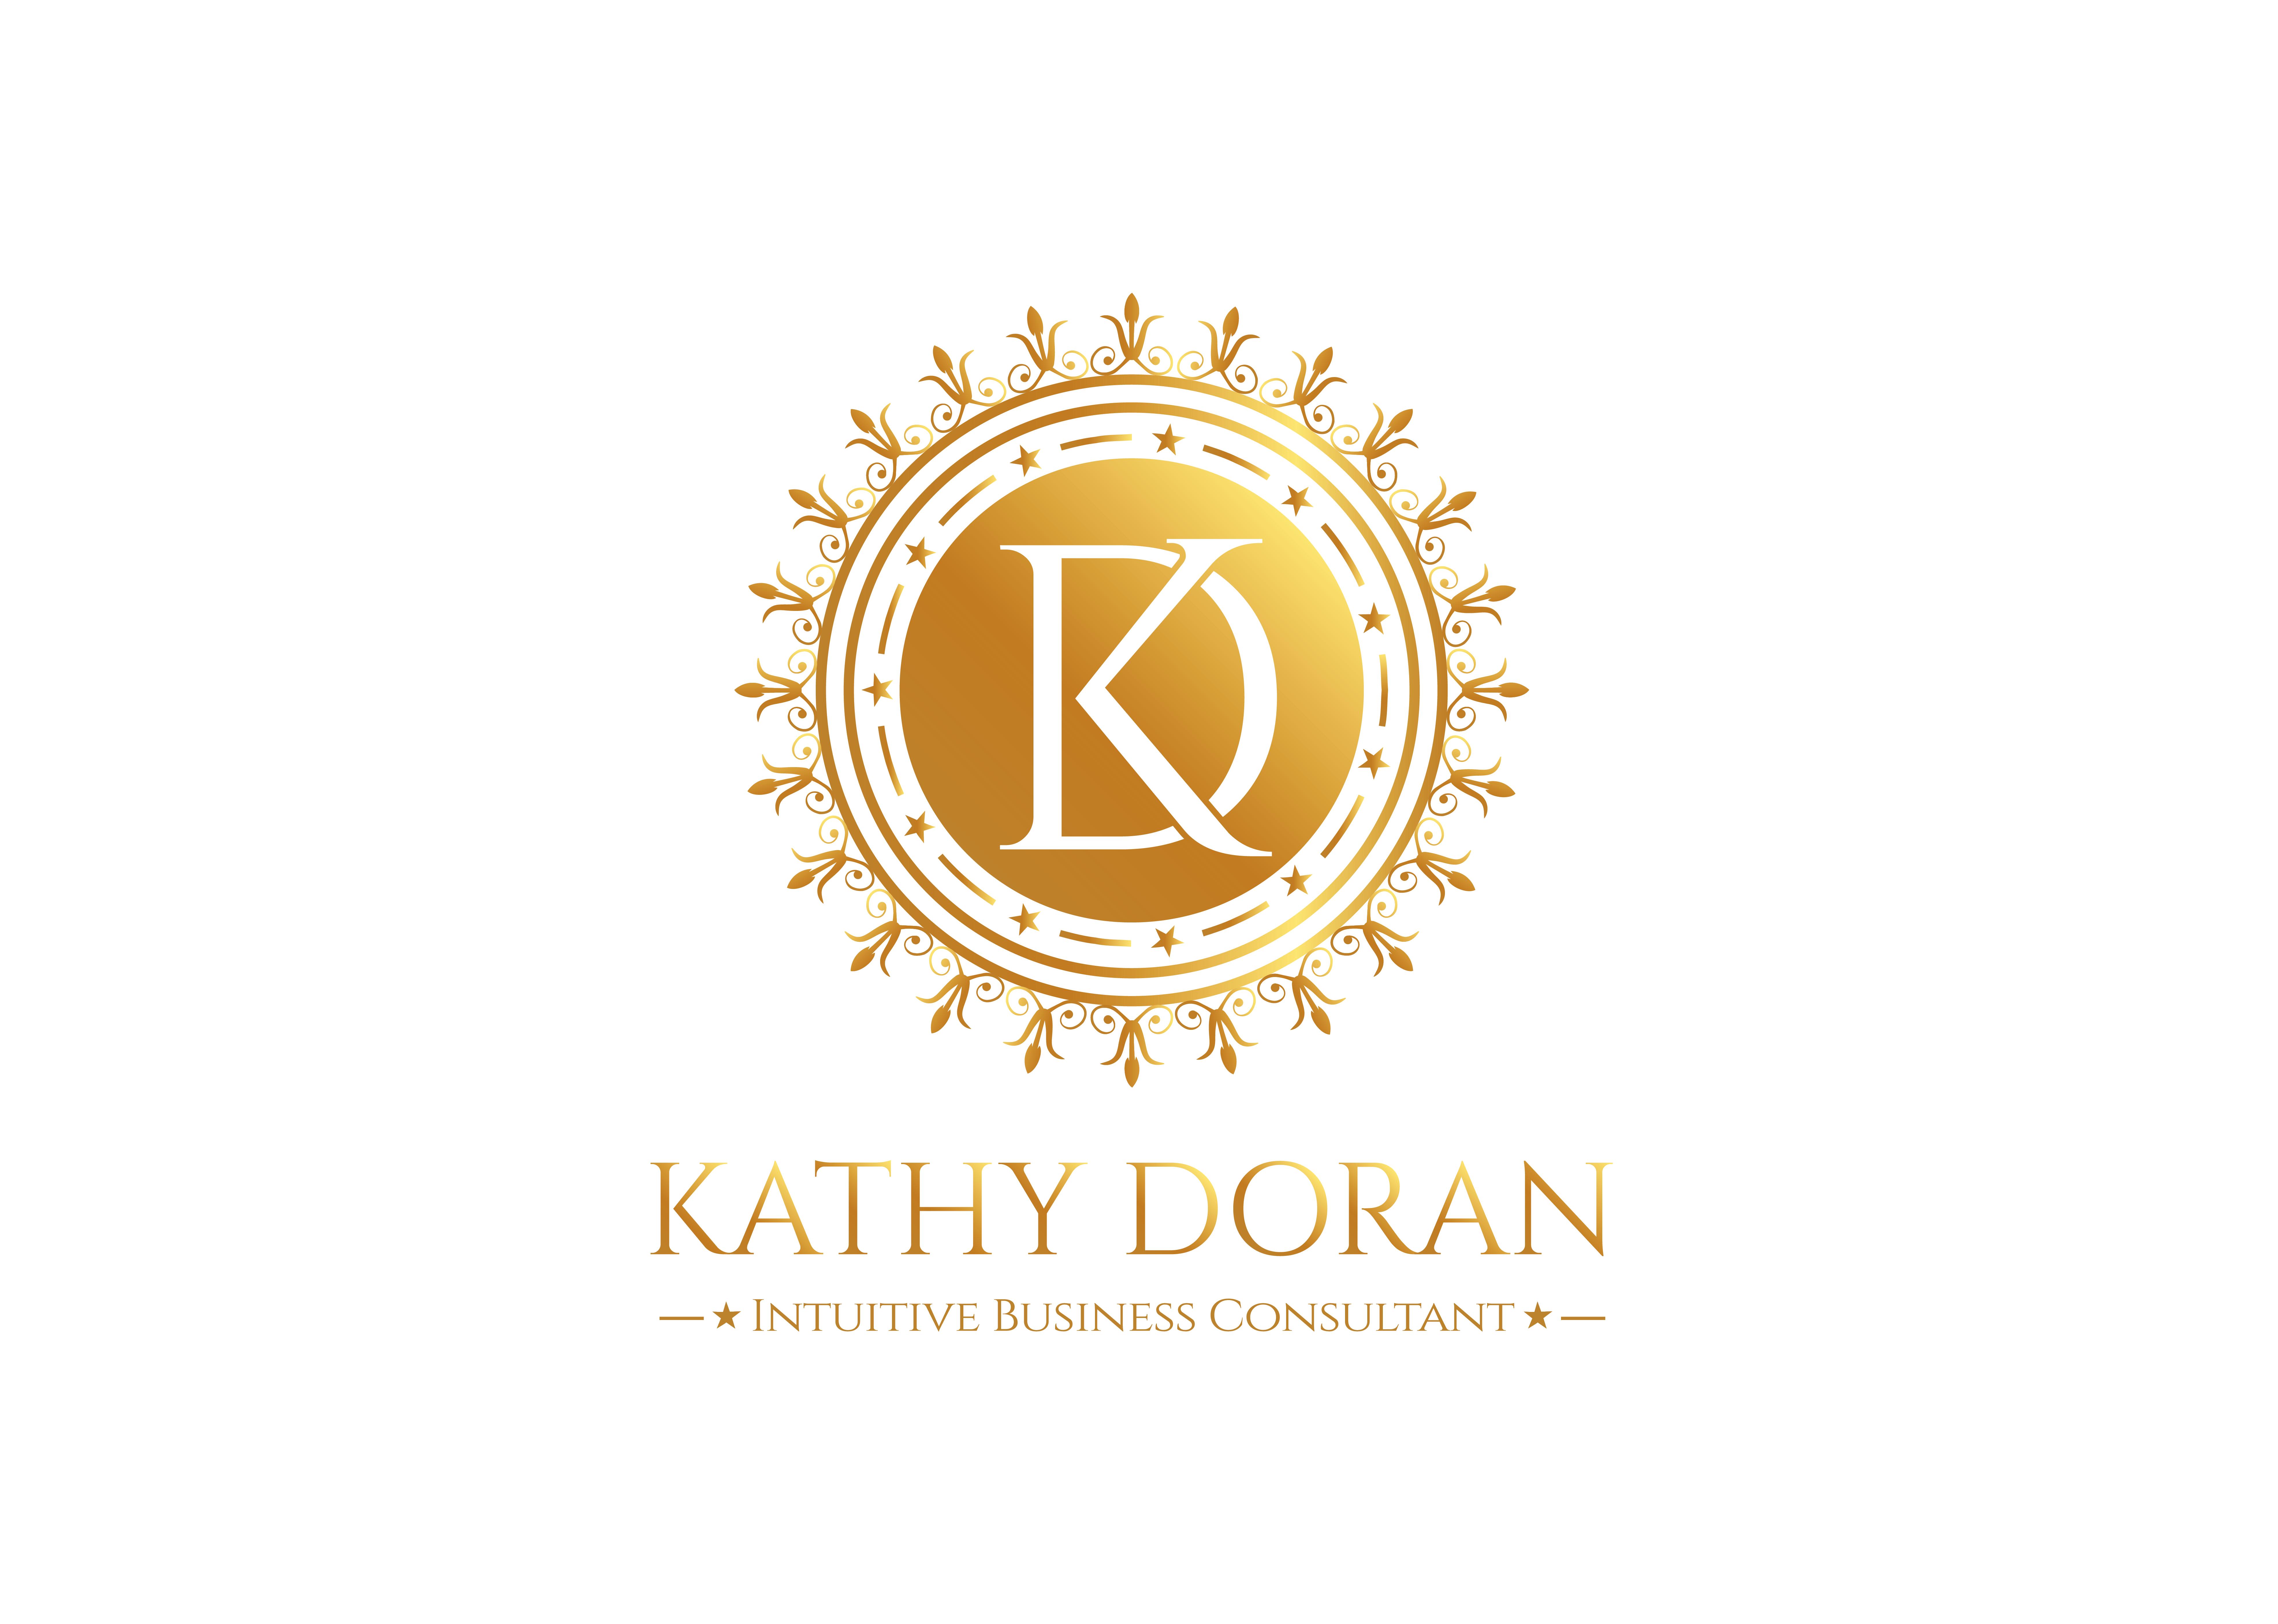 Kathy Doran Intuitive Business Consultant, LLC